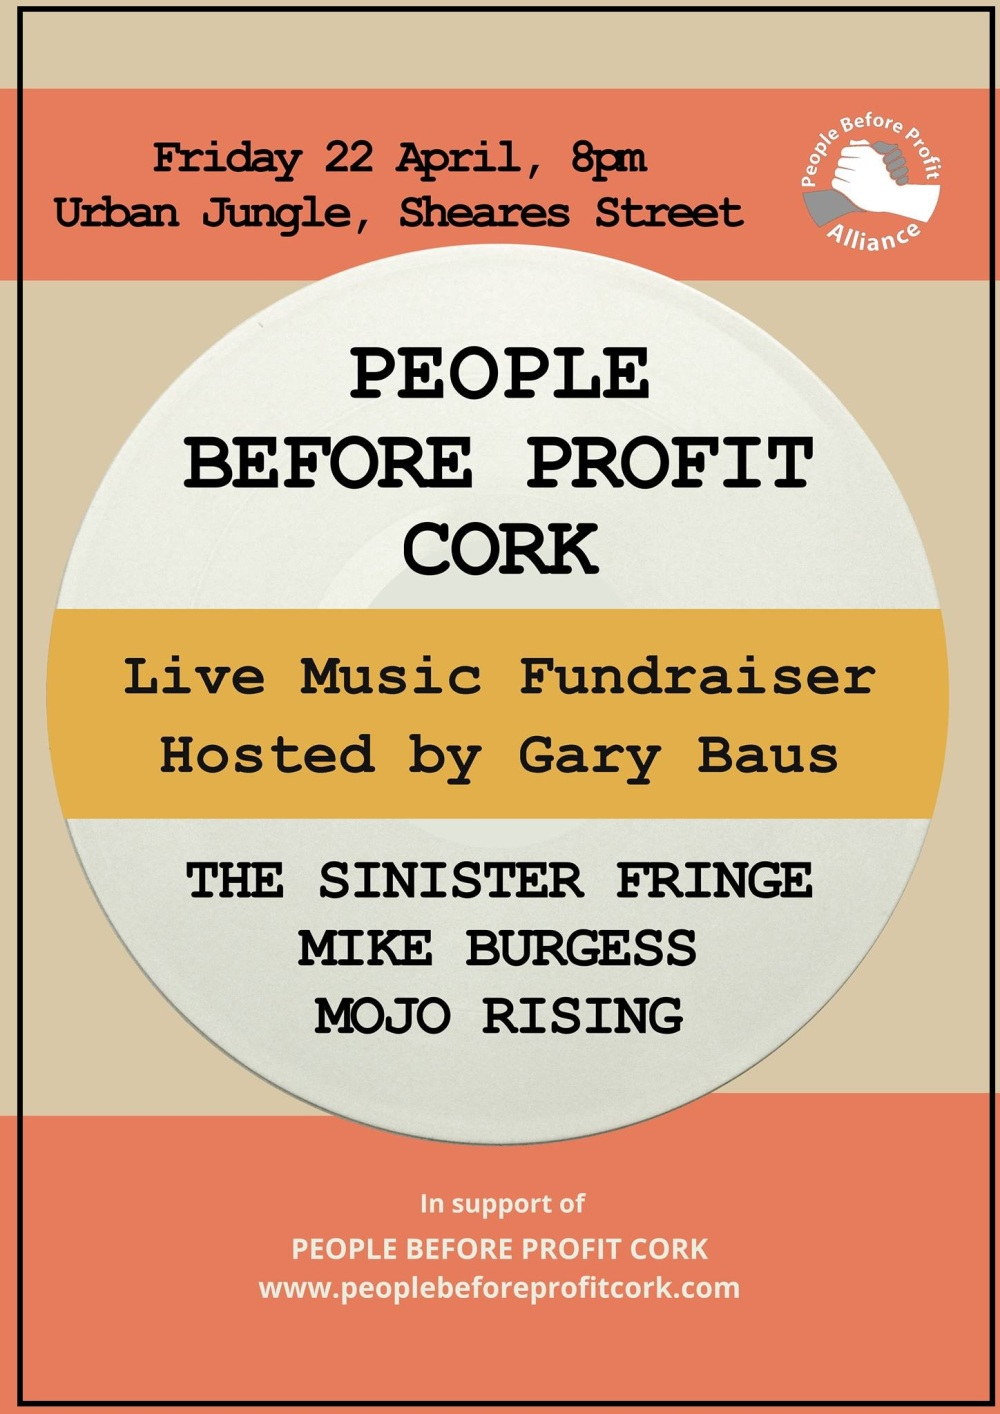 PBP Cork Fundraiser